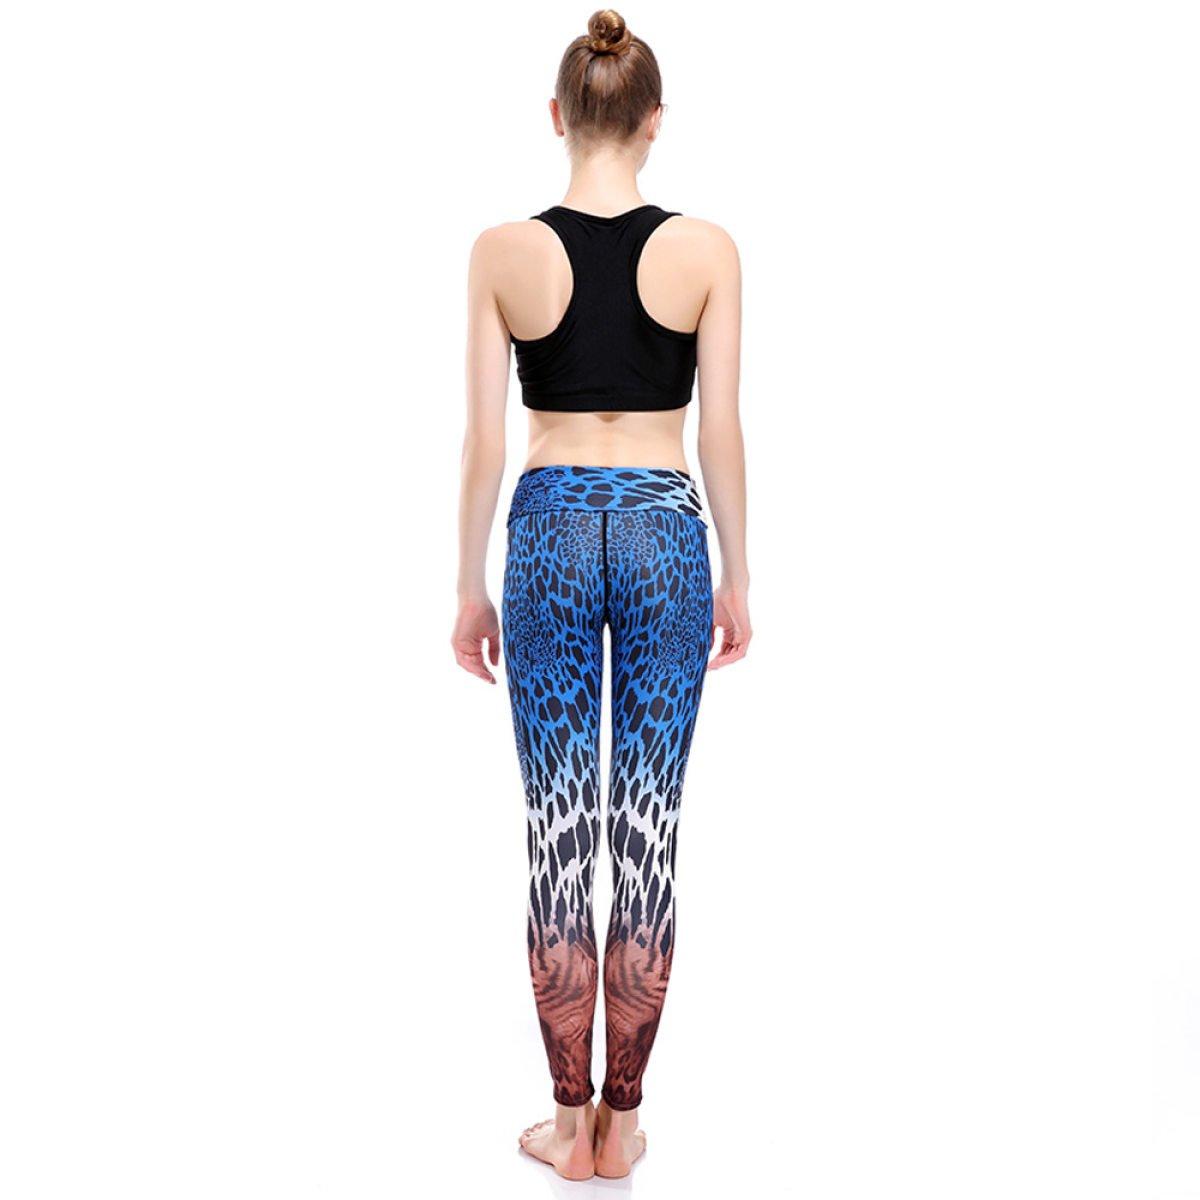 5217bc07088b PXUDB Women's Fashion Blue Leopard Printed Stretch Sport Yoga Elasticity  Leggings Slimming Workout Tights Quick Dry Pencil Pants,085-XXXL:  Amazon.co.uk: ...